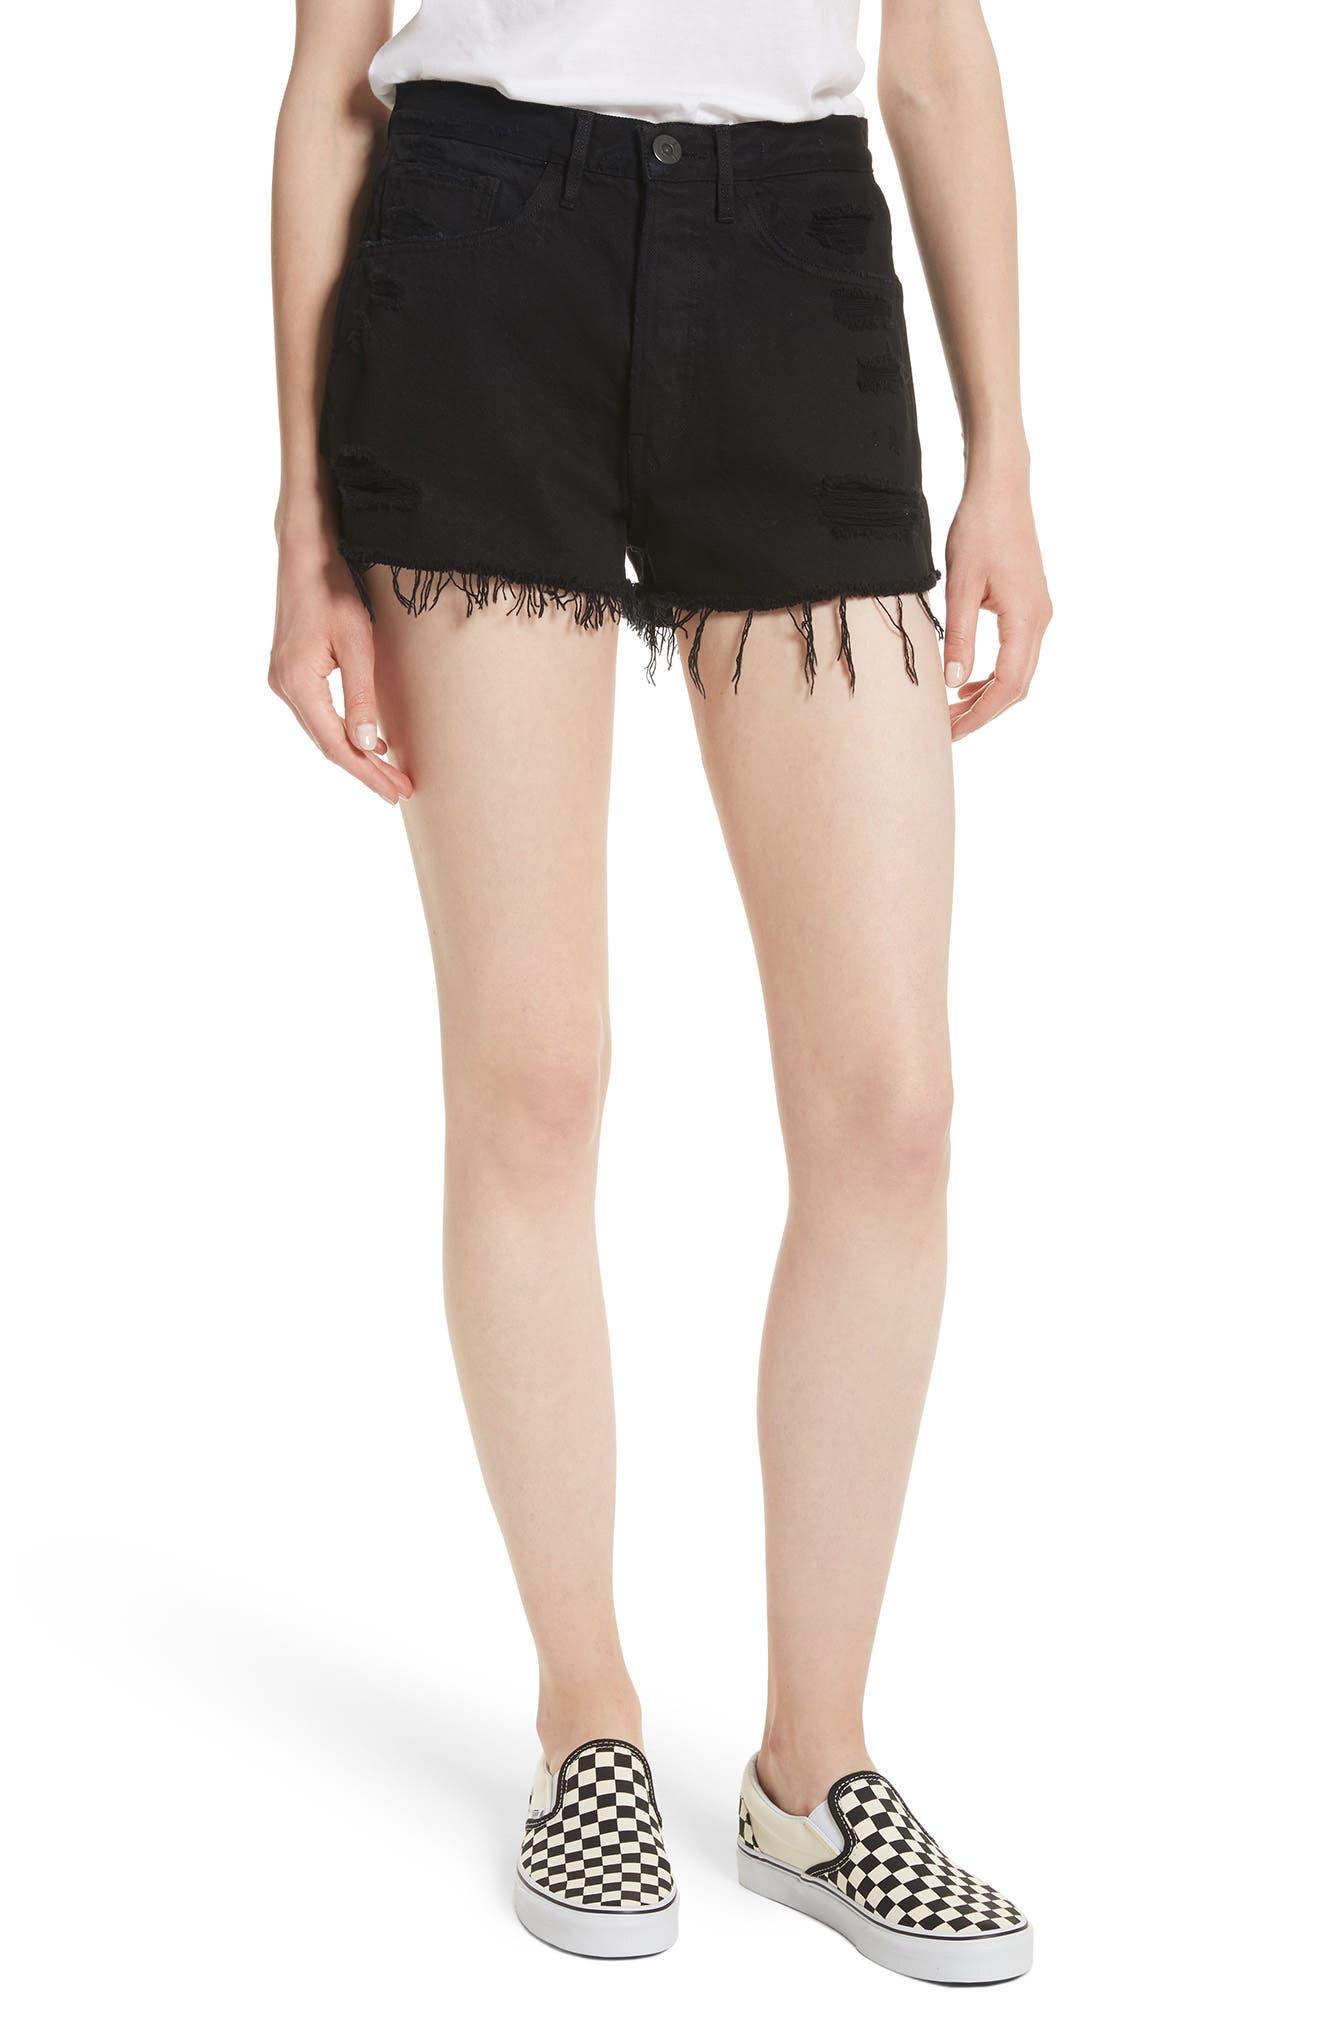 W4 Carter Ripped High Waist Denim Shorts,                             Main thumbnail 1, color,                             002